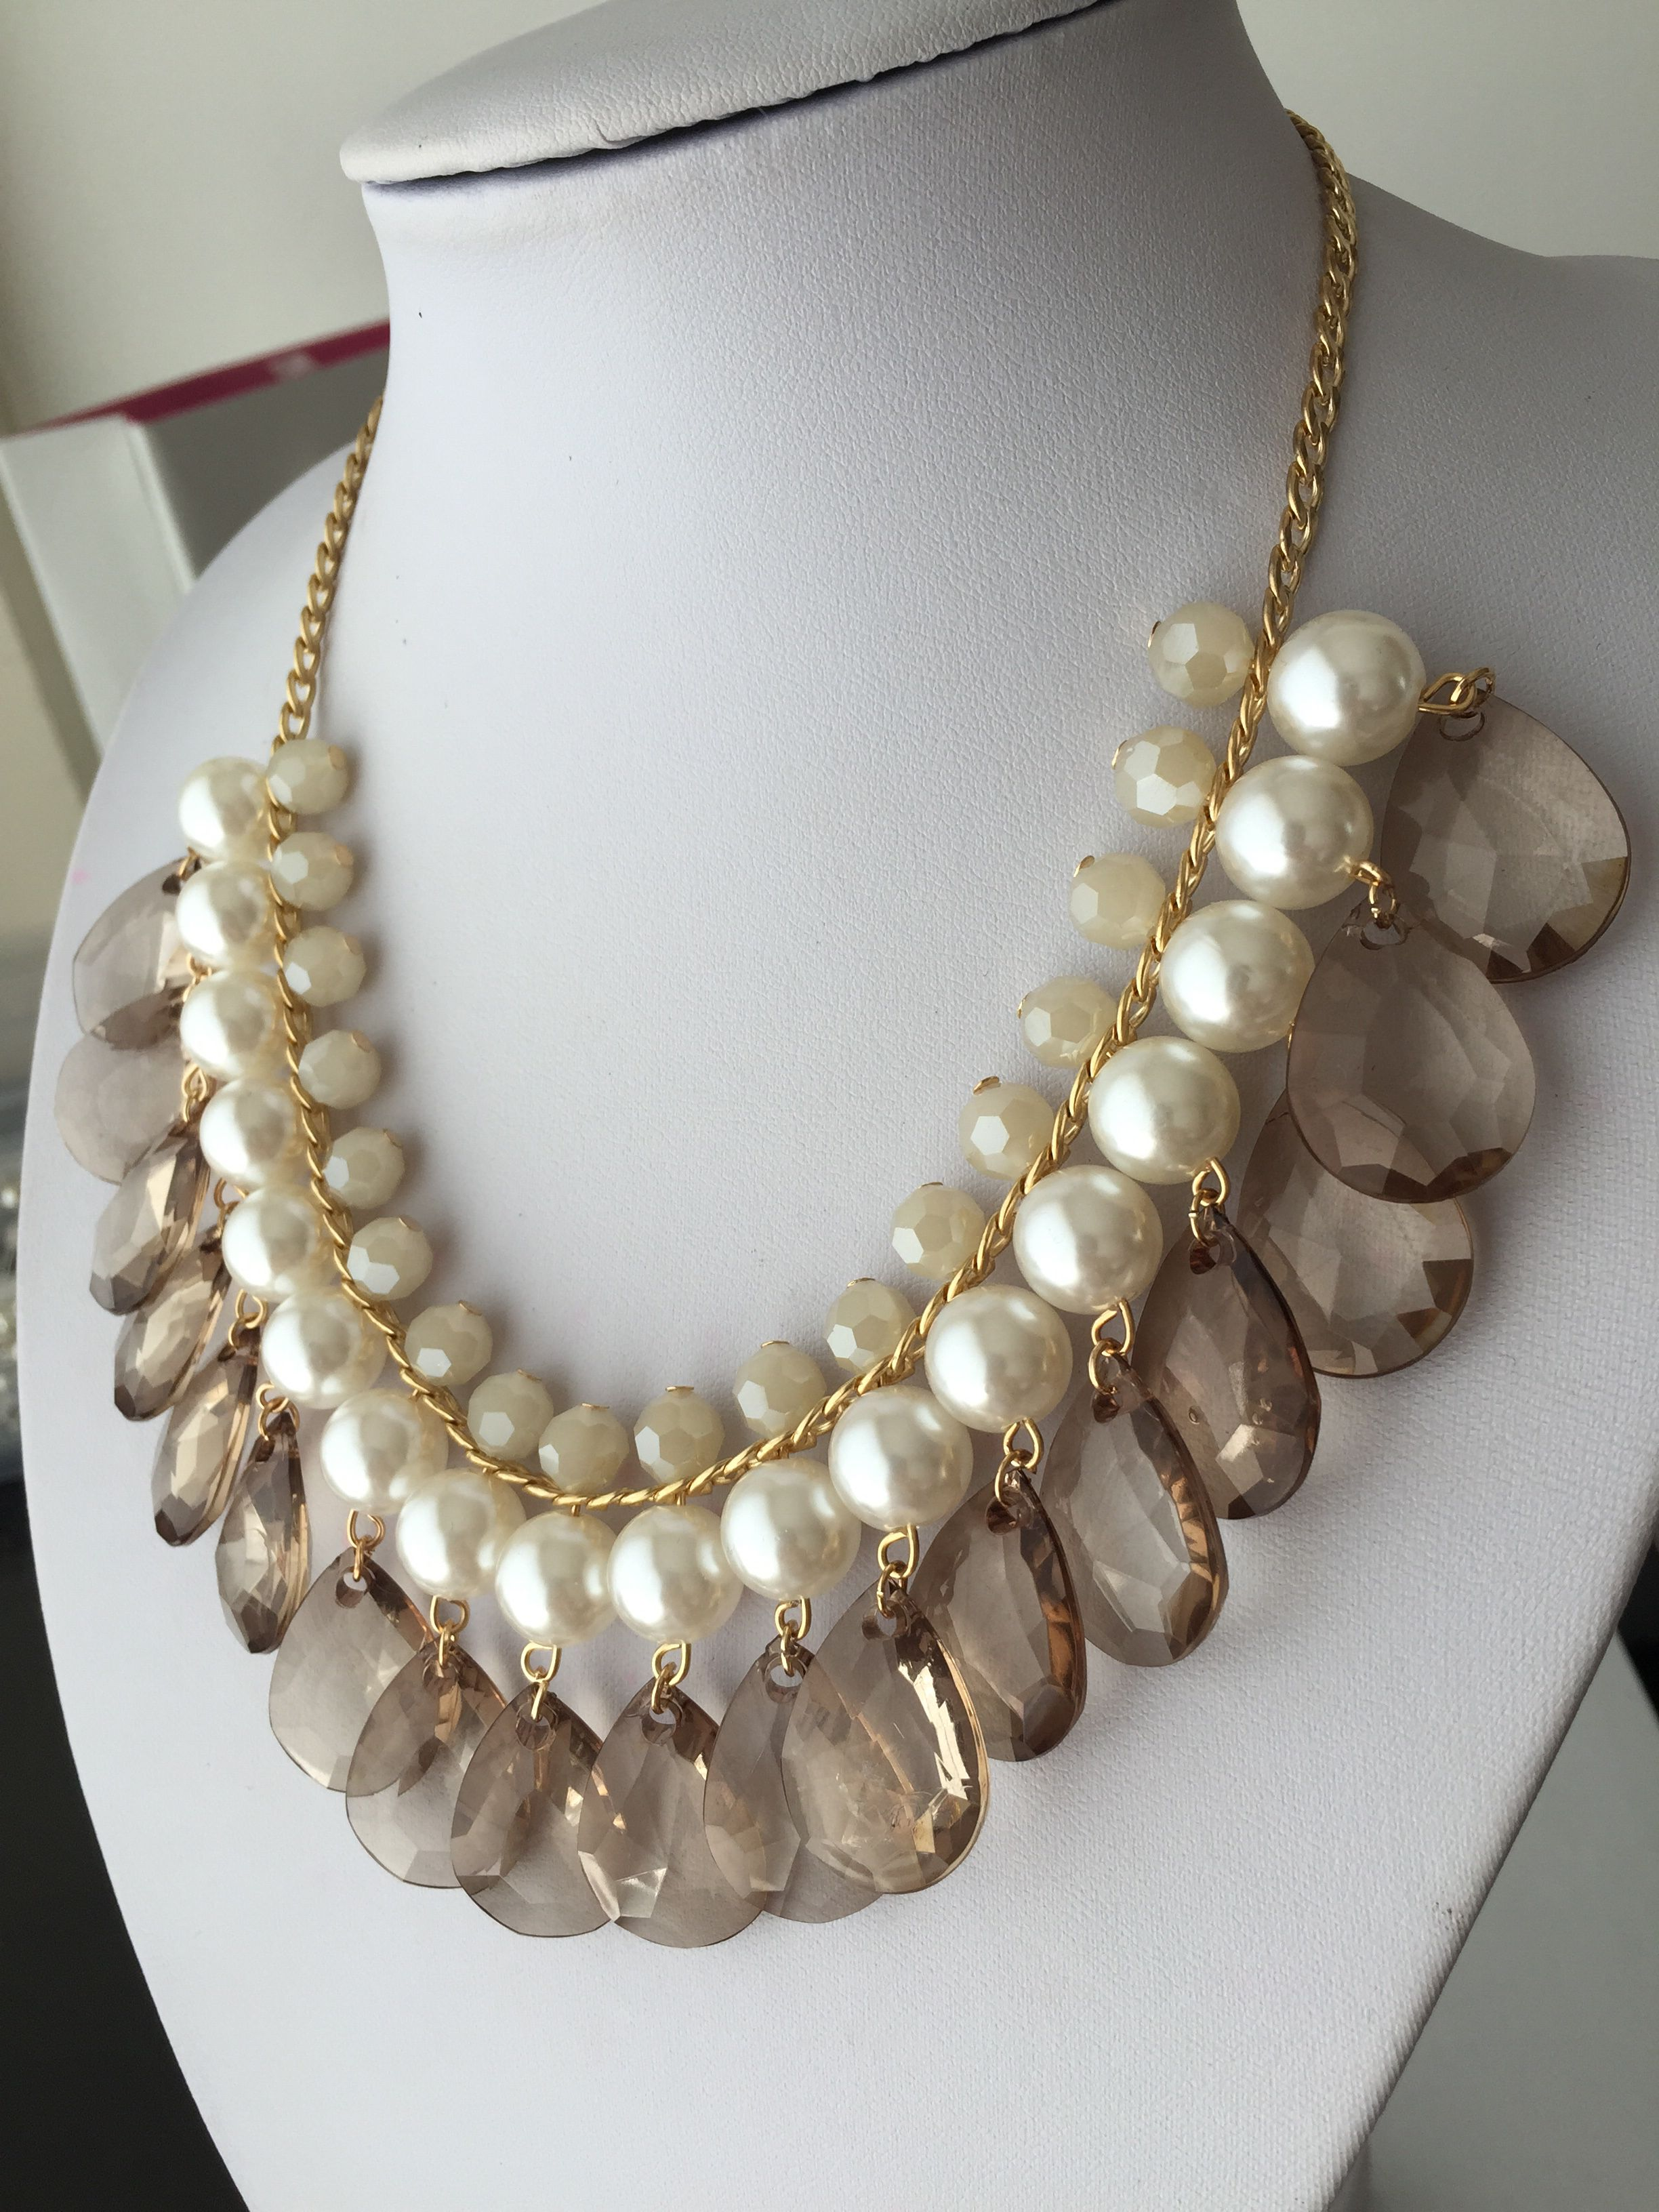 2cef528529c7 Collar elegante Collares Dorados